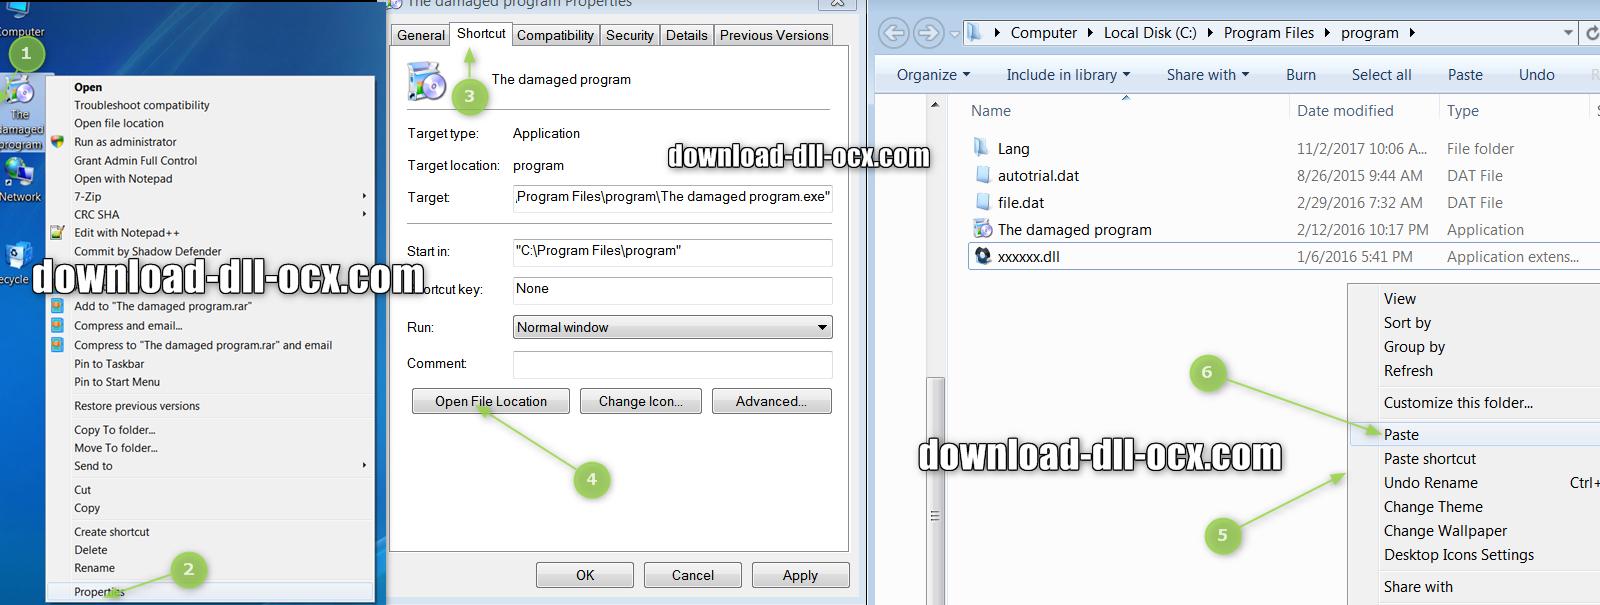 how to install salhelper3MSC.dll file? for fix missing